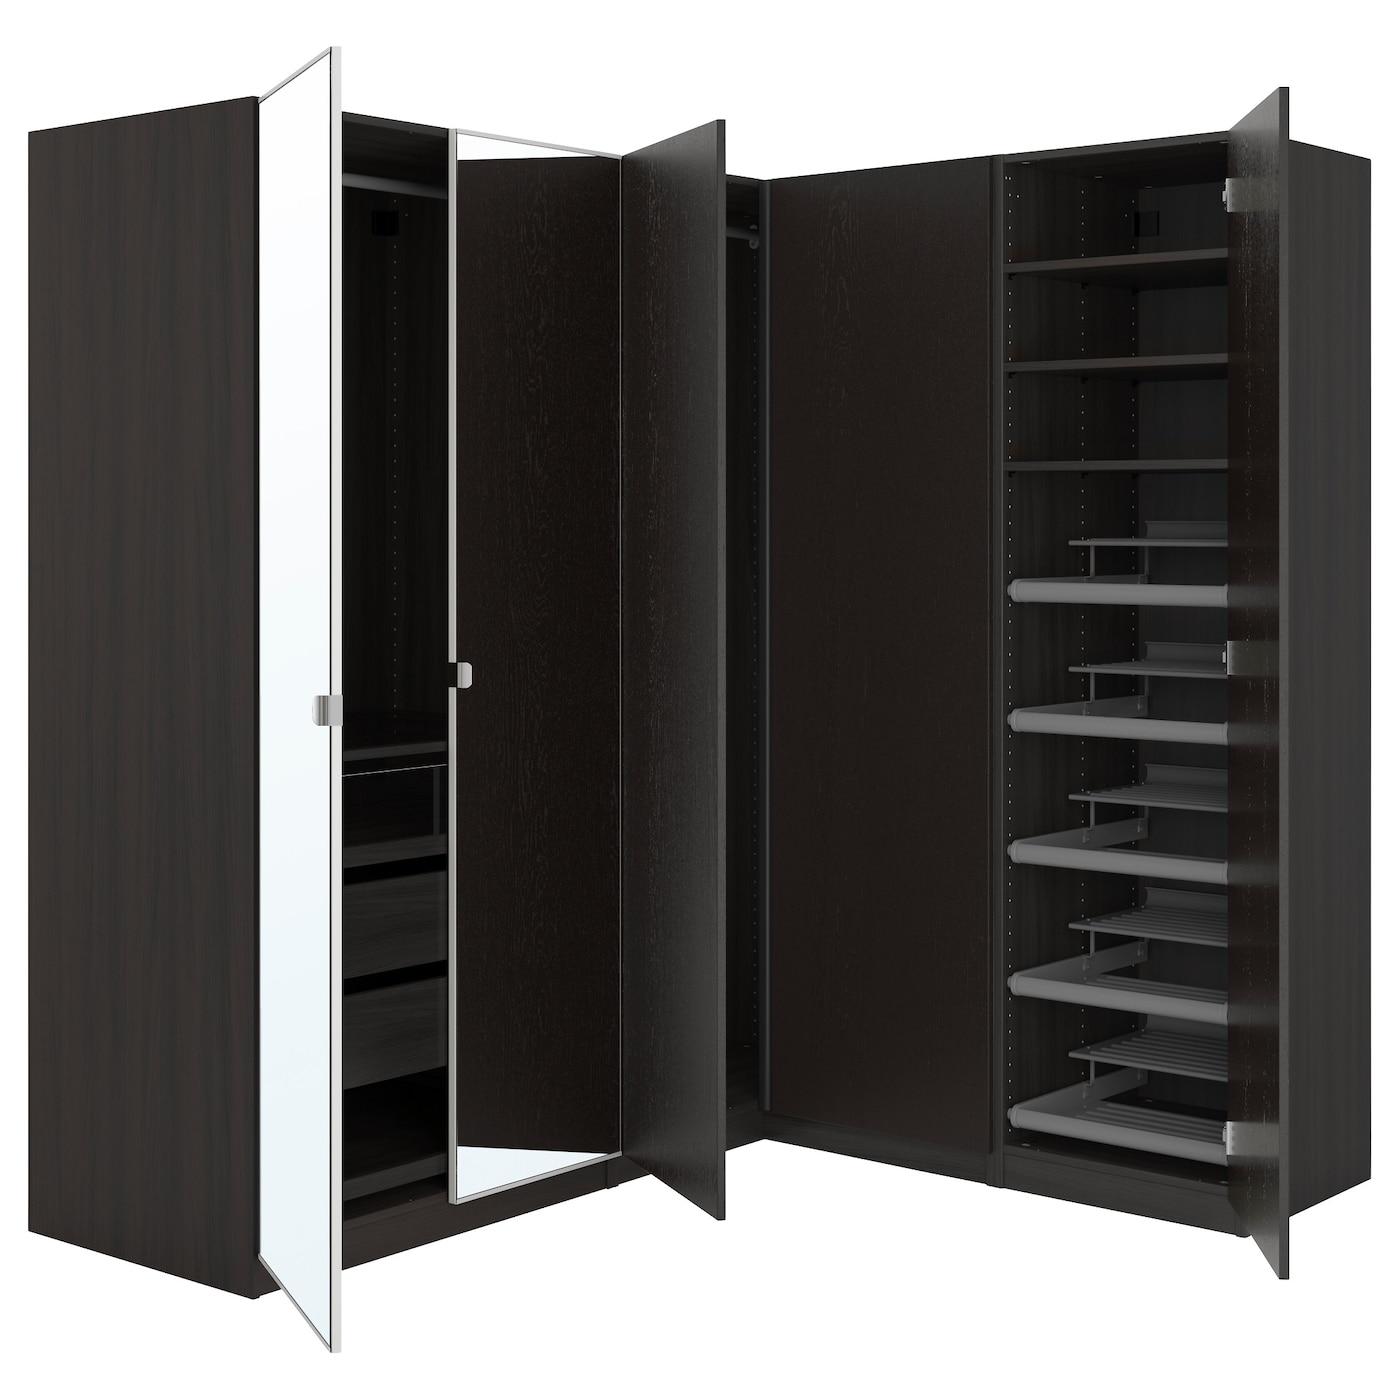 pax corner wardrobe black brown nexus vikedal 210 160 x 201 cm ikea. Black Bedroom Furniture Sets. Home Design Ideas